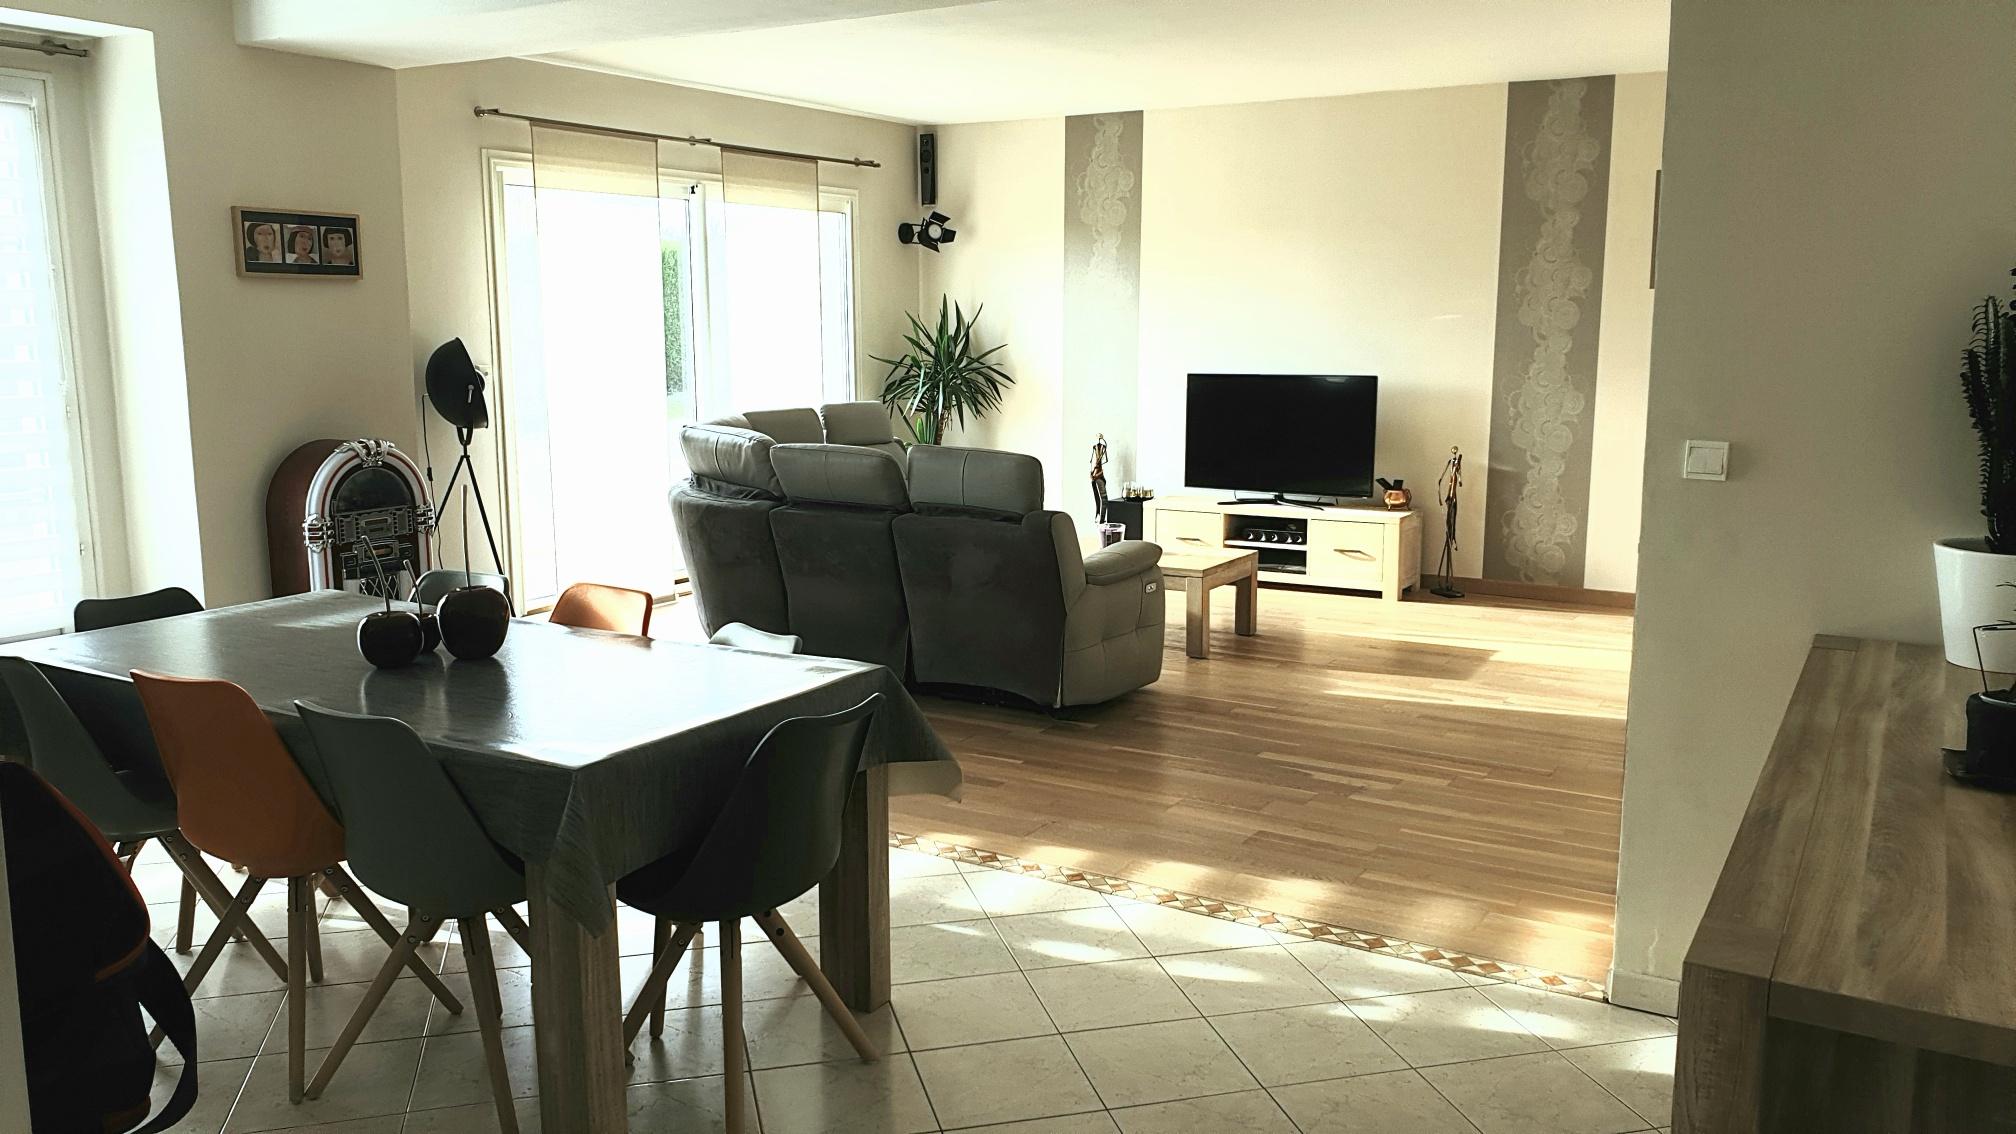 living_room_guestshouse_24h_lemans_b&b